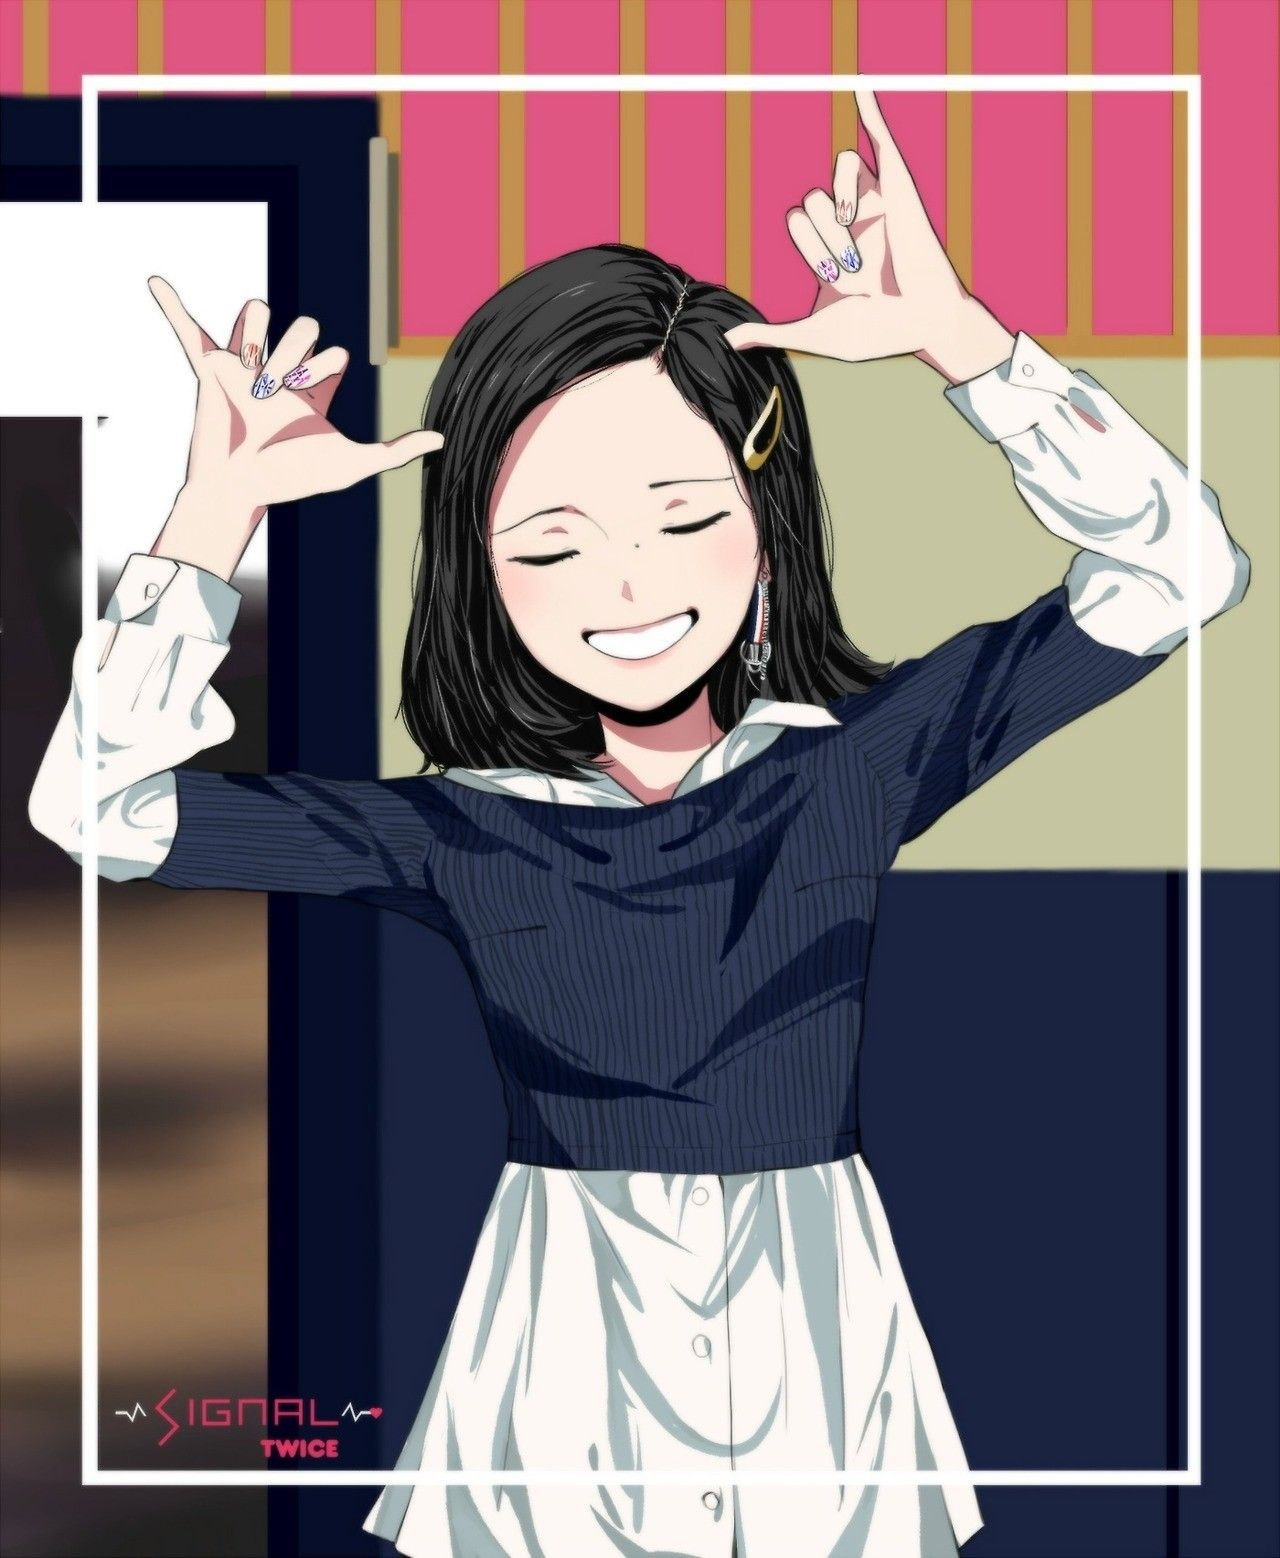 Mina (Twice member) Animasi